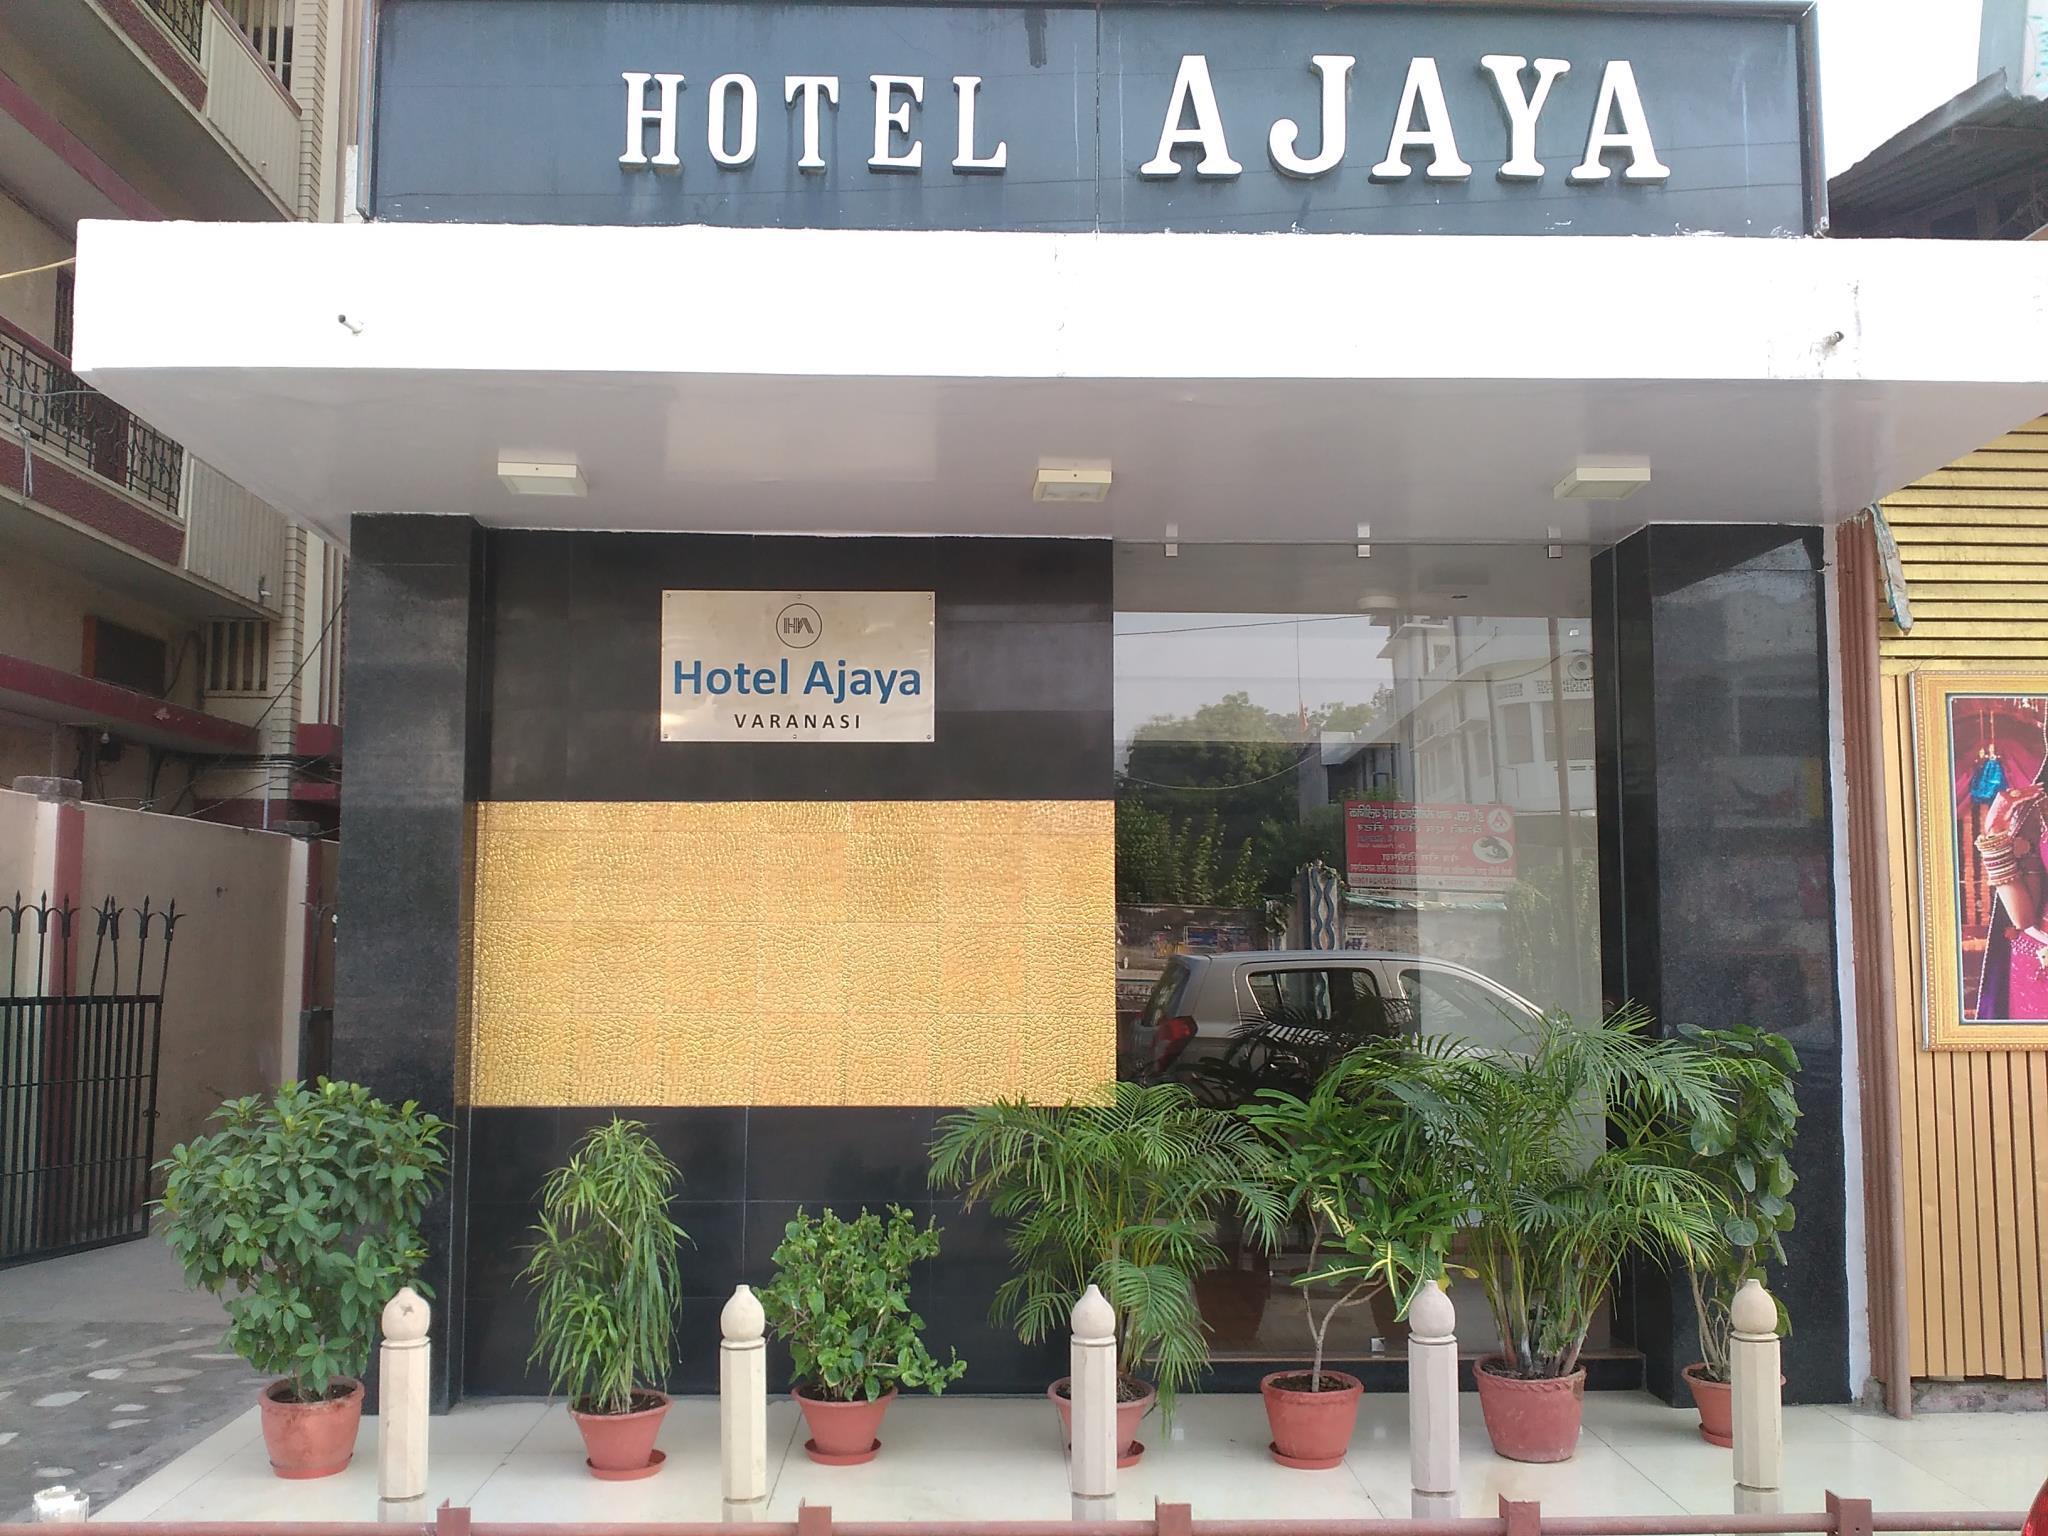 Hotel Ajaya